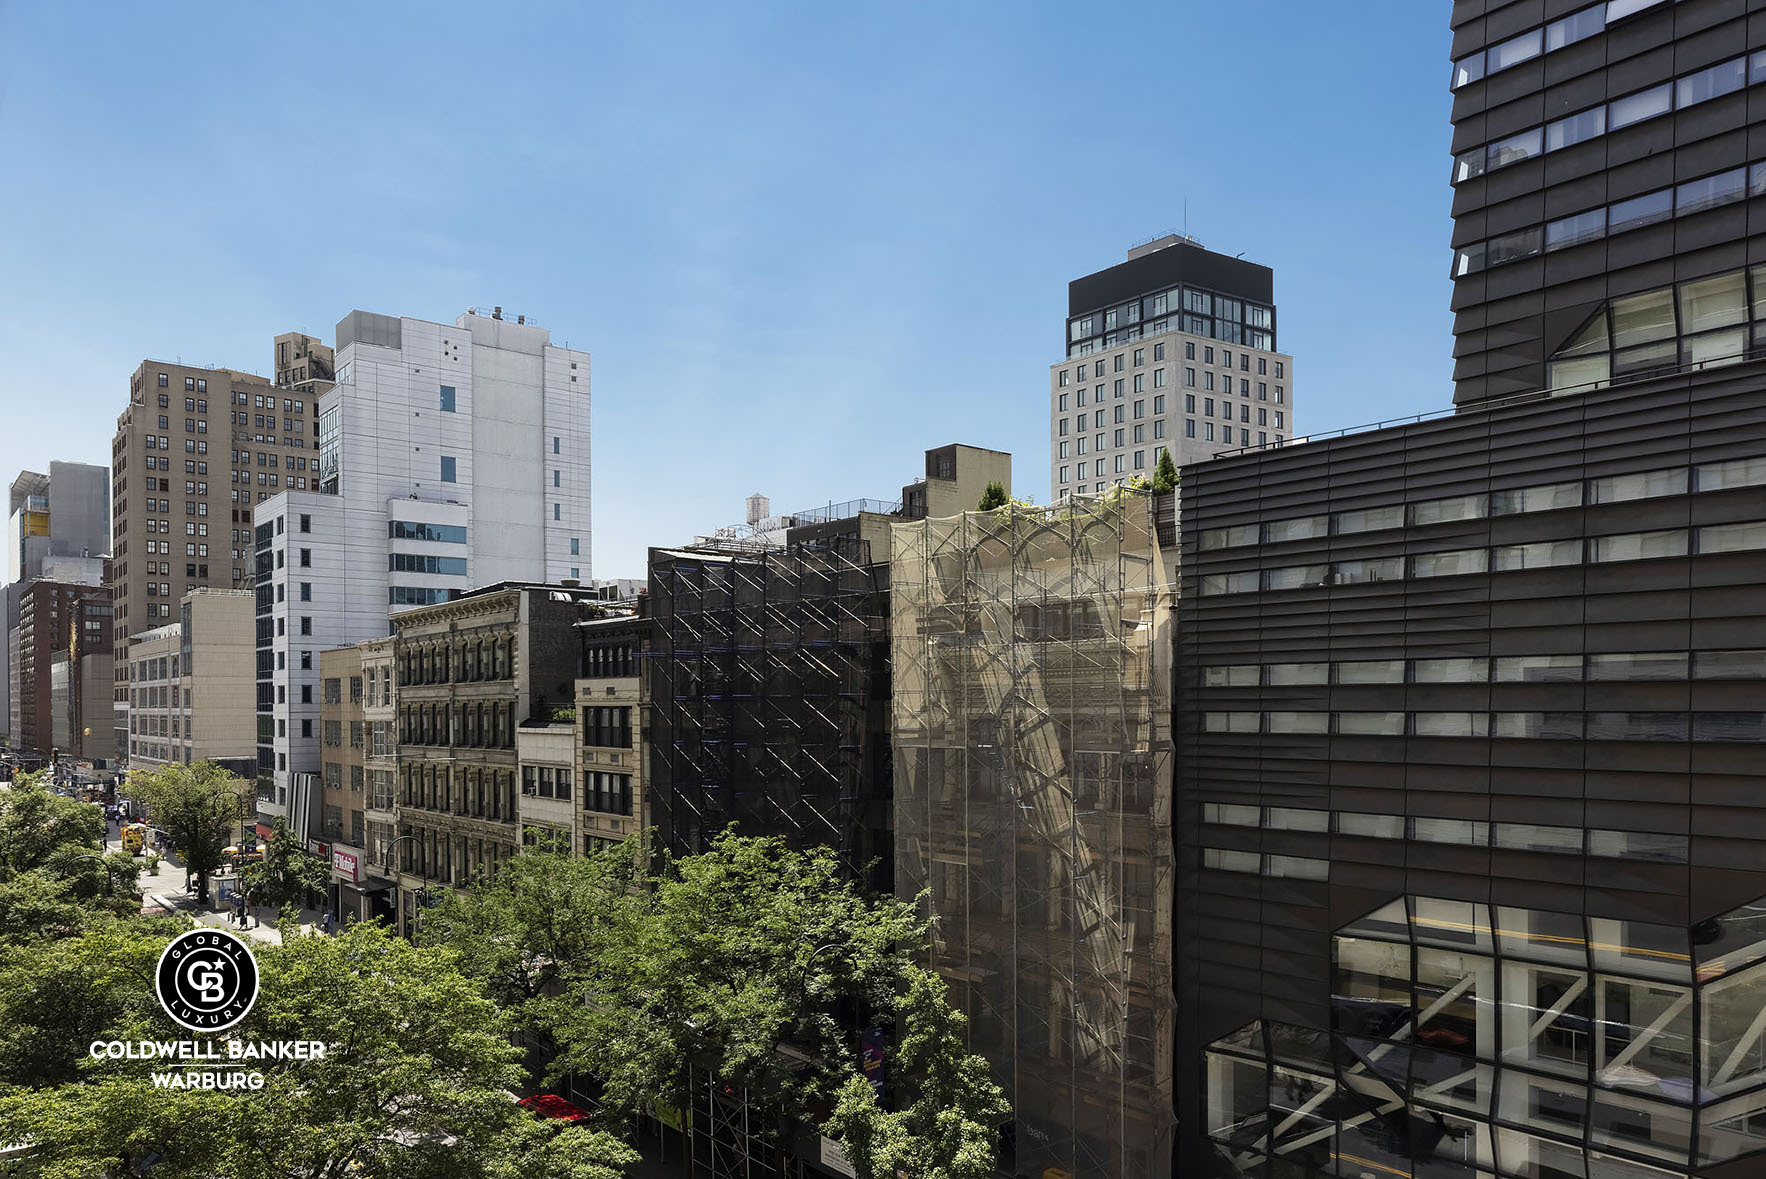 69 Fifth Avenue Flatiron District New York NY 10003